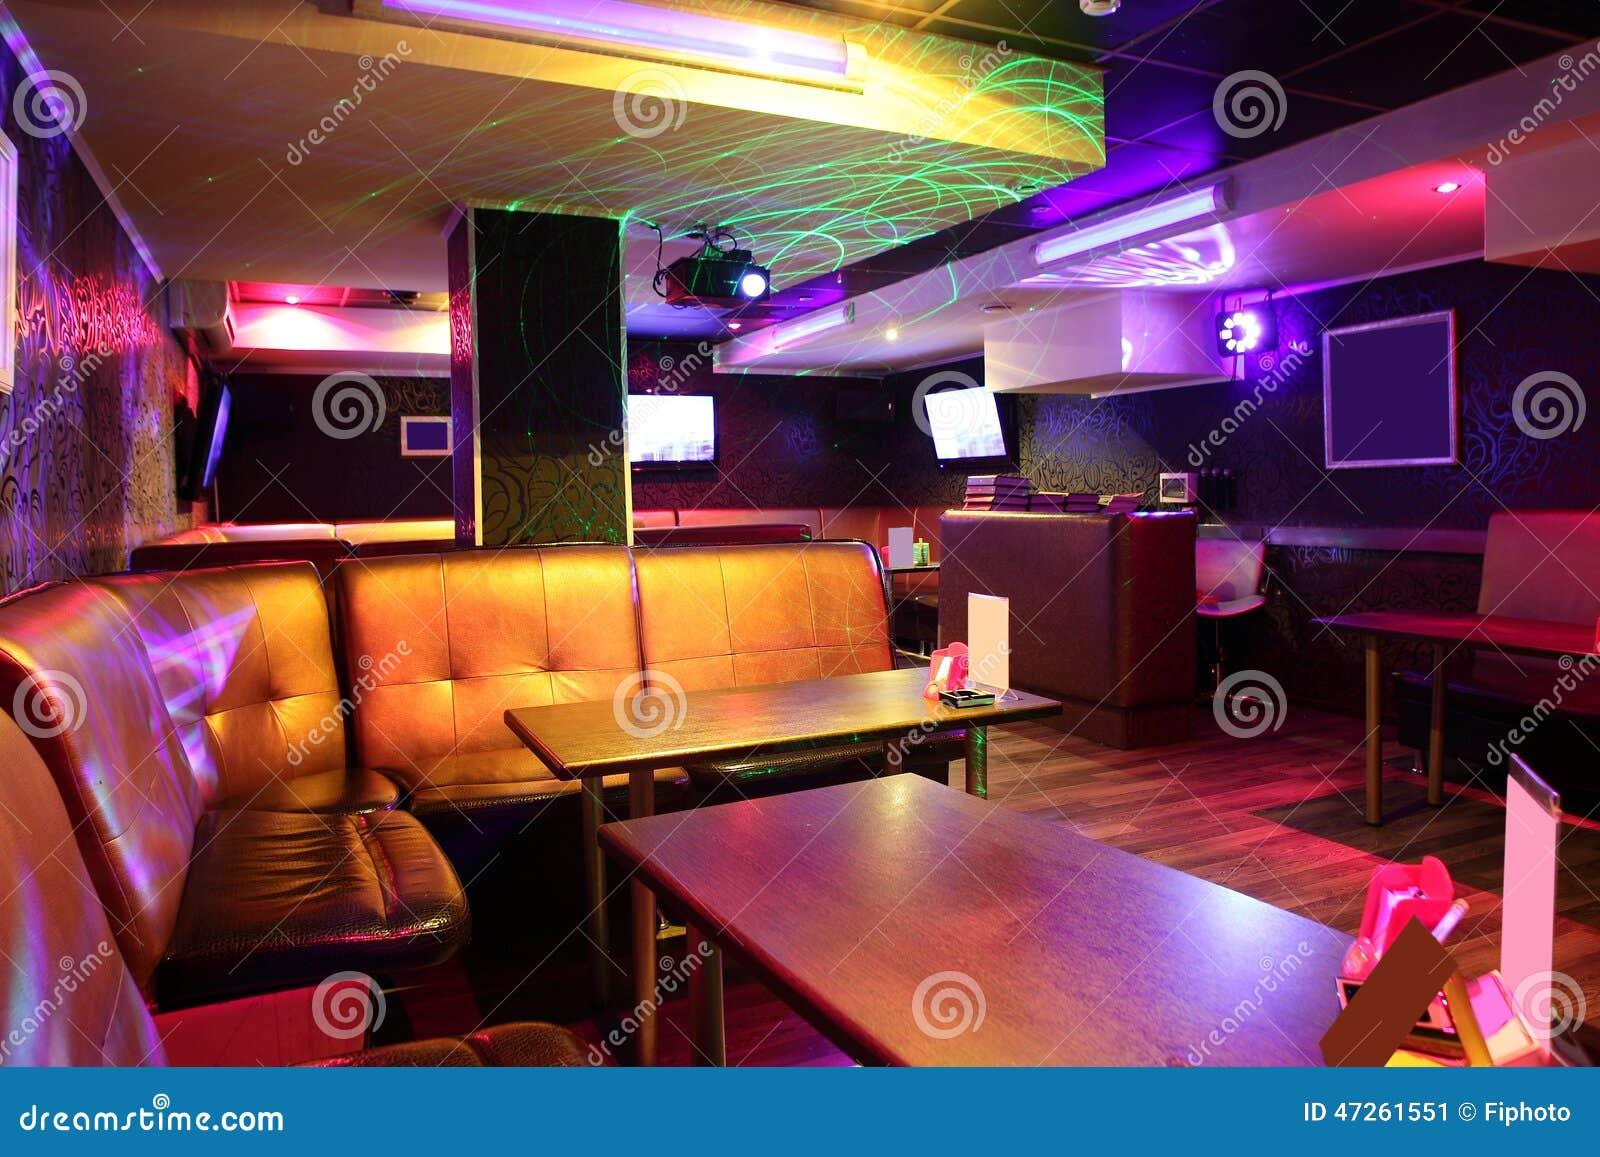 beautiful european night club interior stock image image of lamp rh dreamstime com